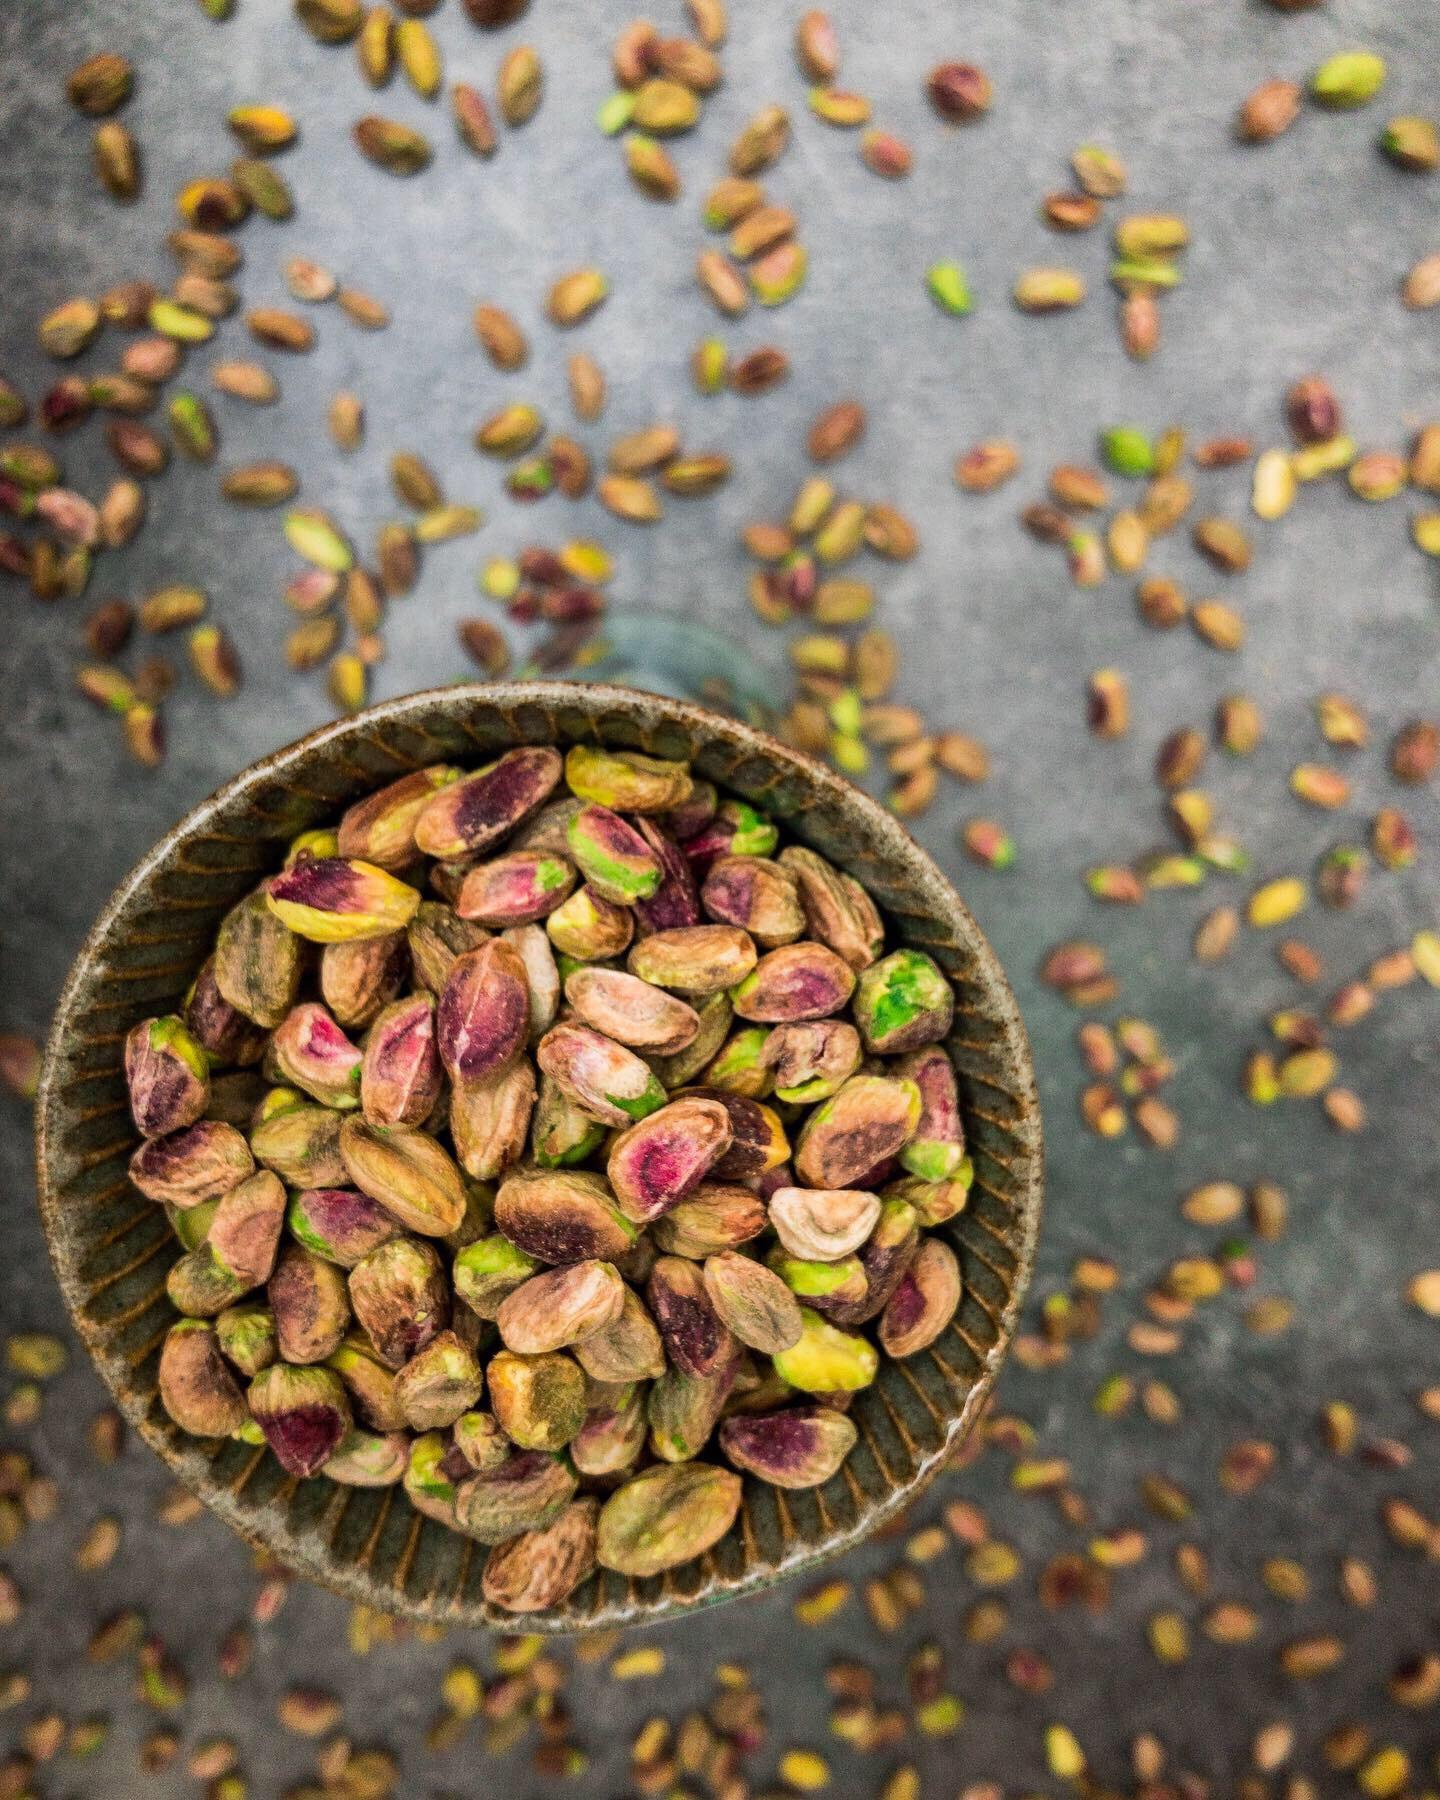 Recipe for making kulfi